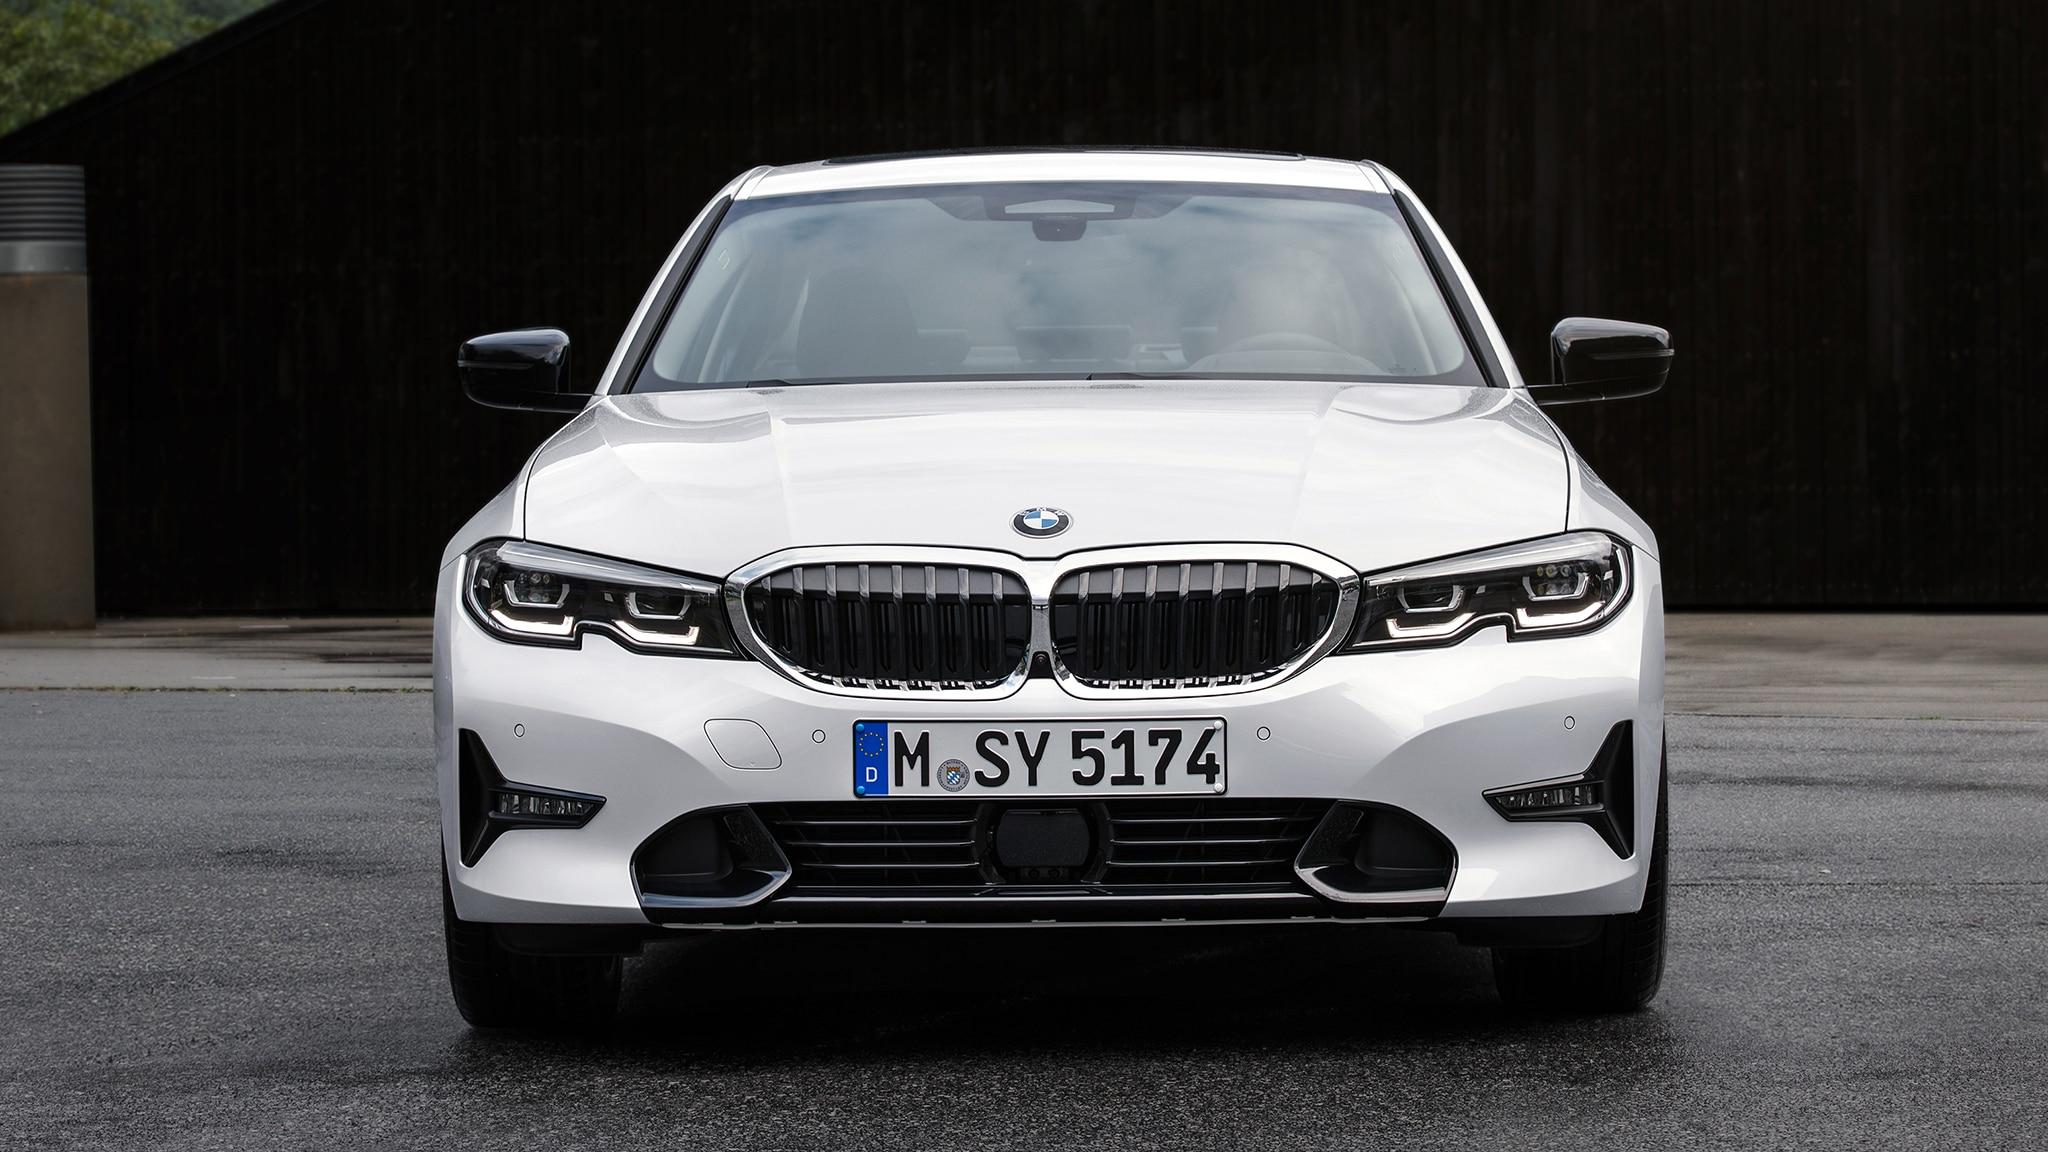 2019 BMW 3-series Design Analysis: Exterior, Interior